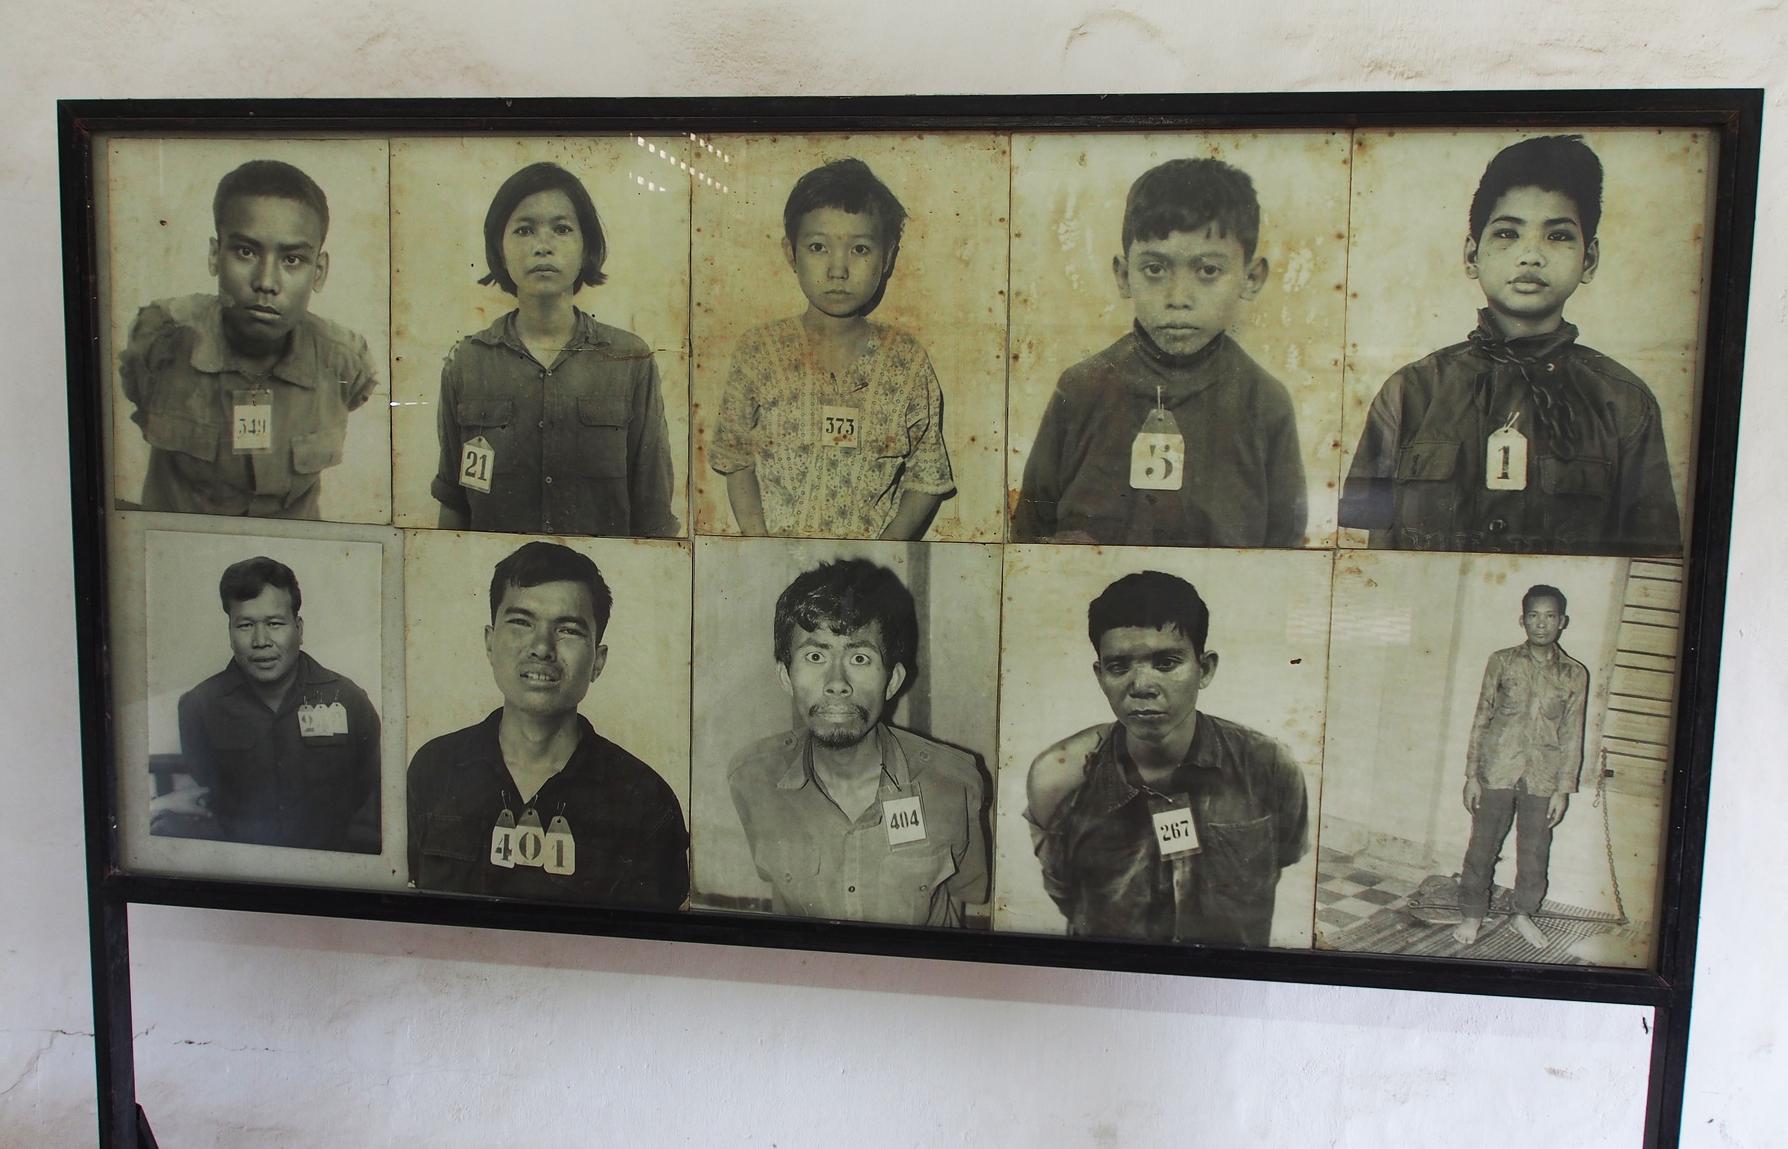 Kambodscha: Urteilsverkündung im Rote Khmer Prozess